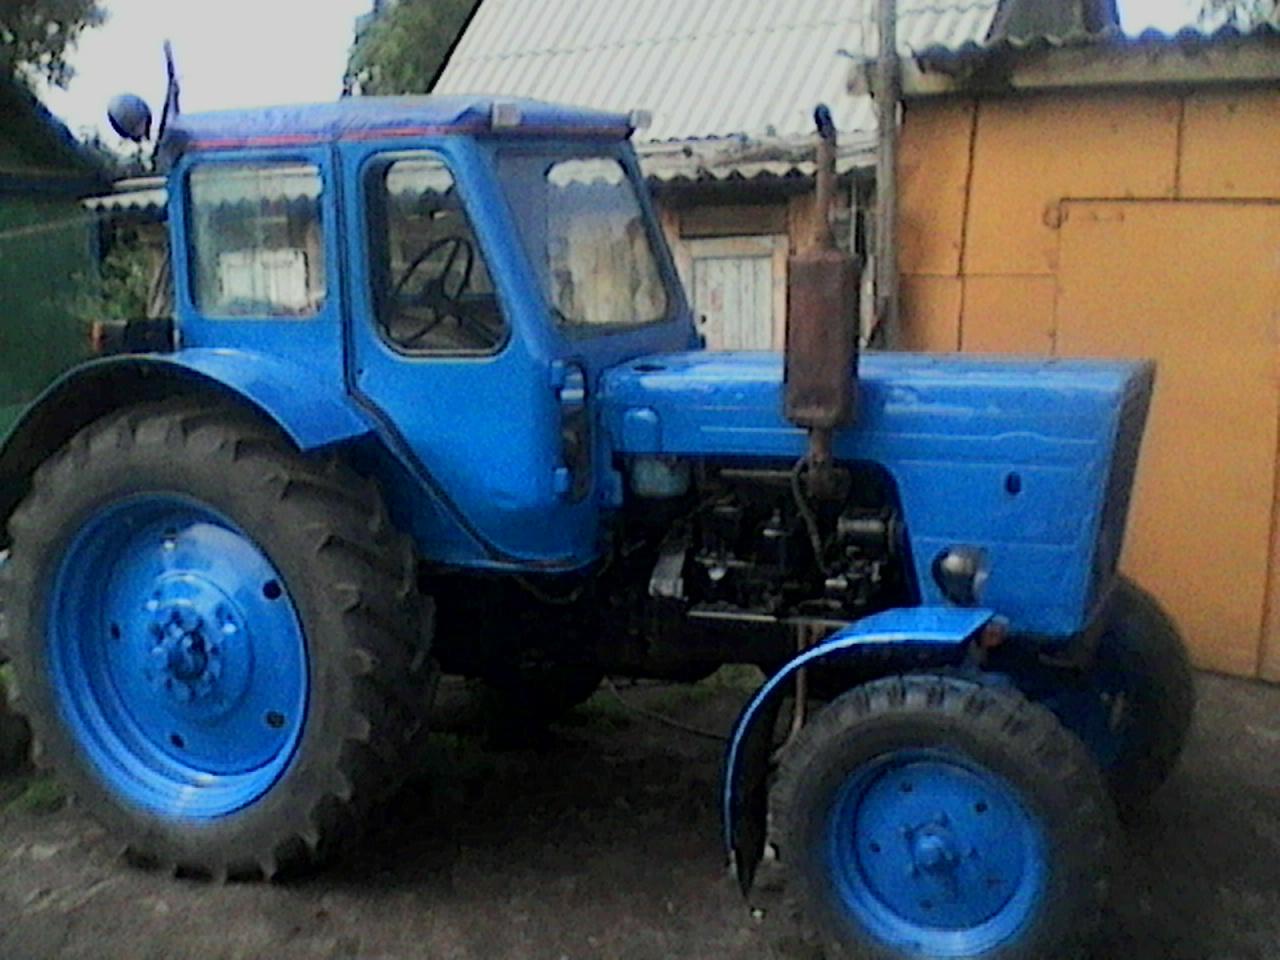 Трактор Беларус МТЗ 82.1-23/12 Балочник (2017г)